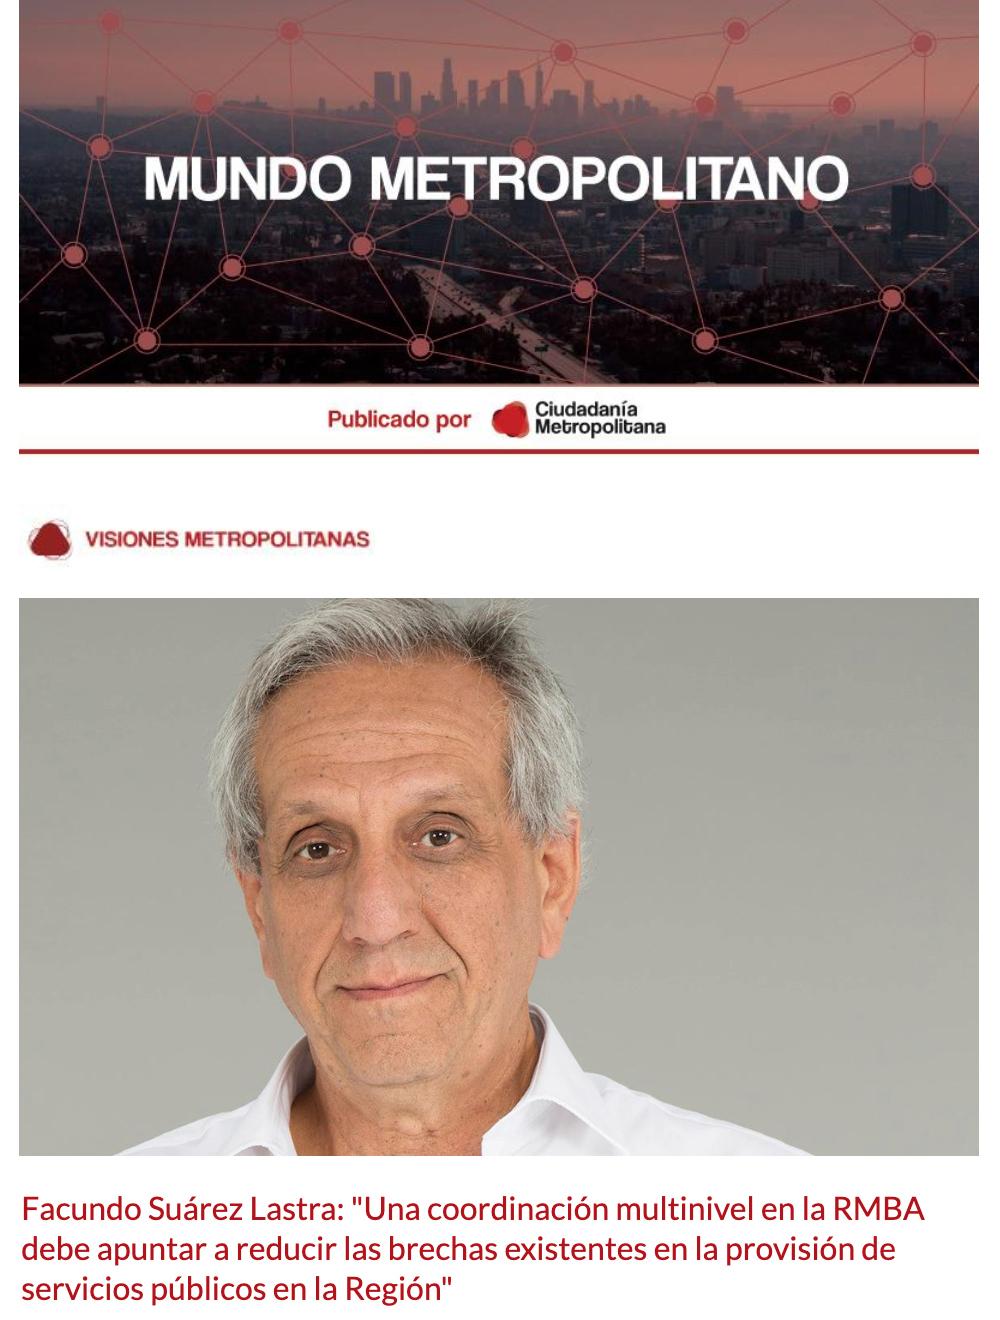 Newsletter Mundo Metropolitano 1